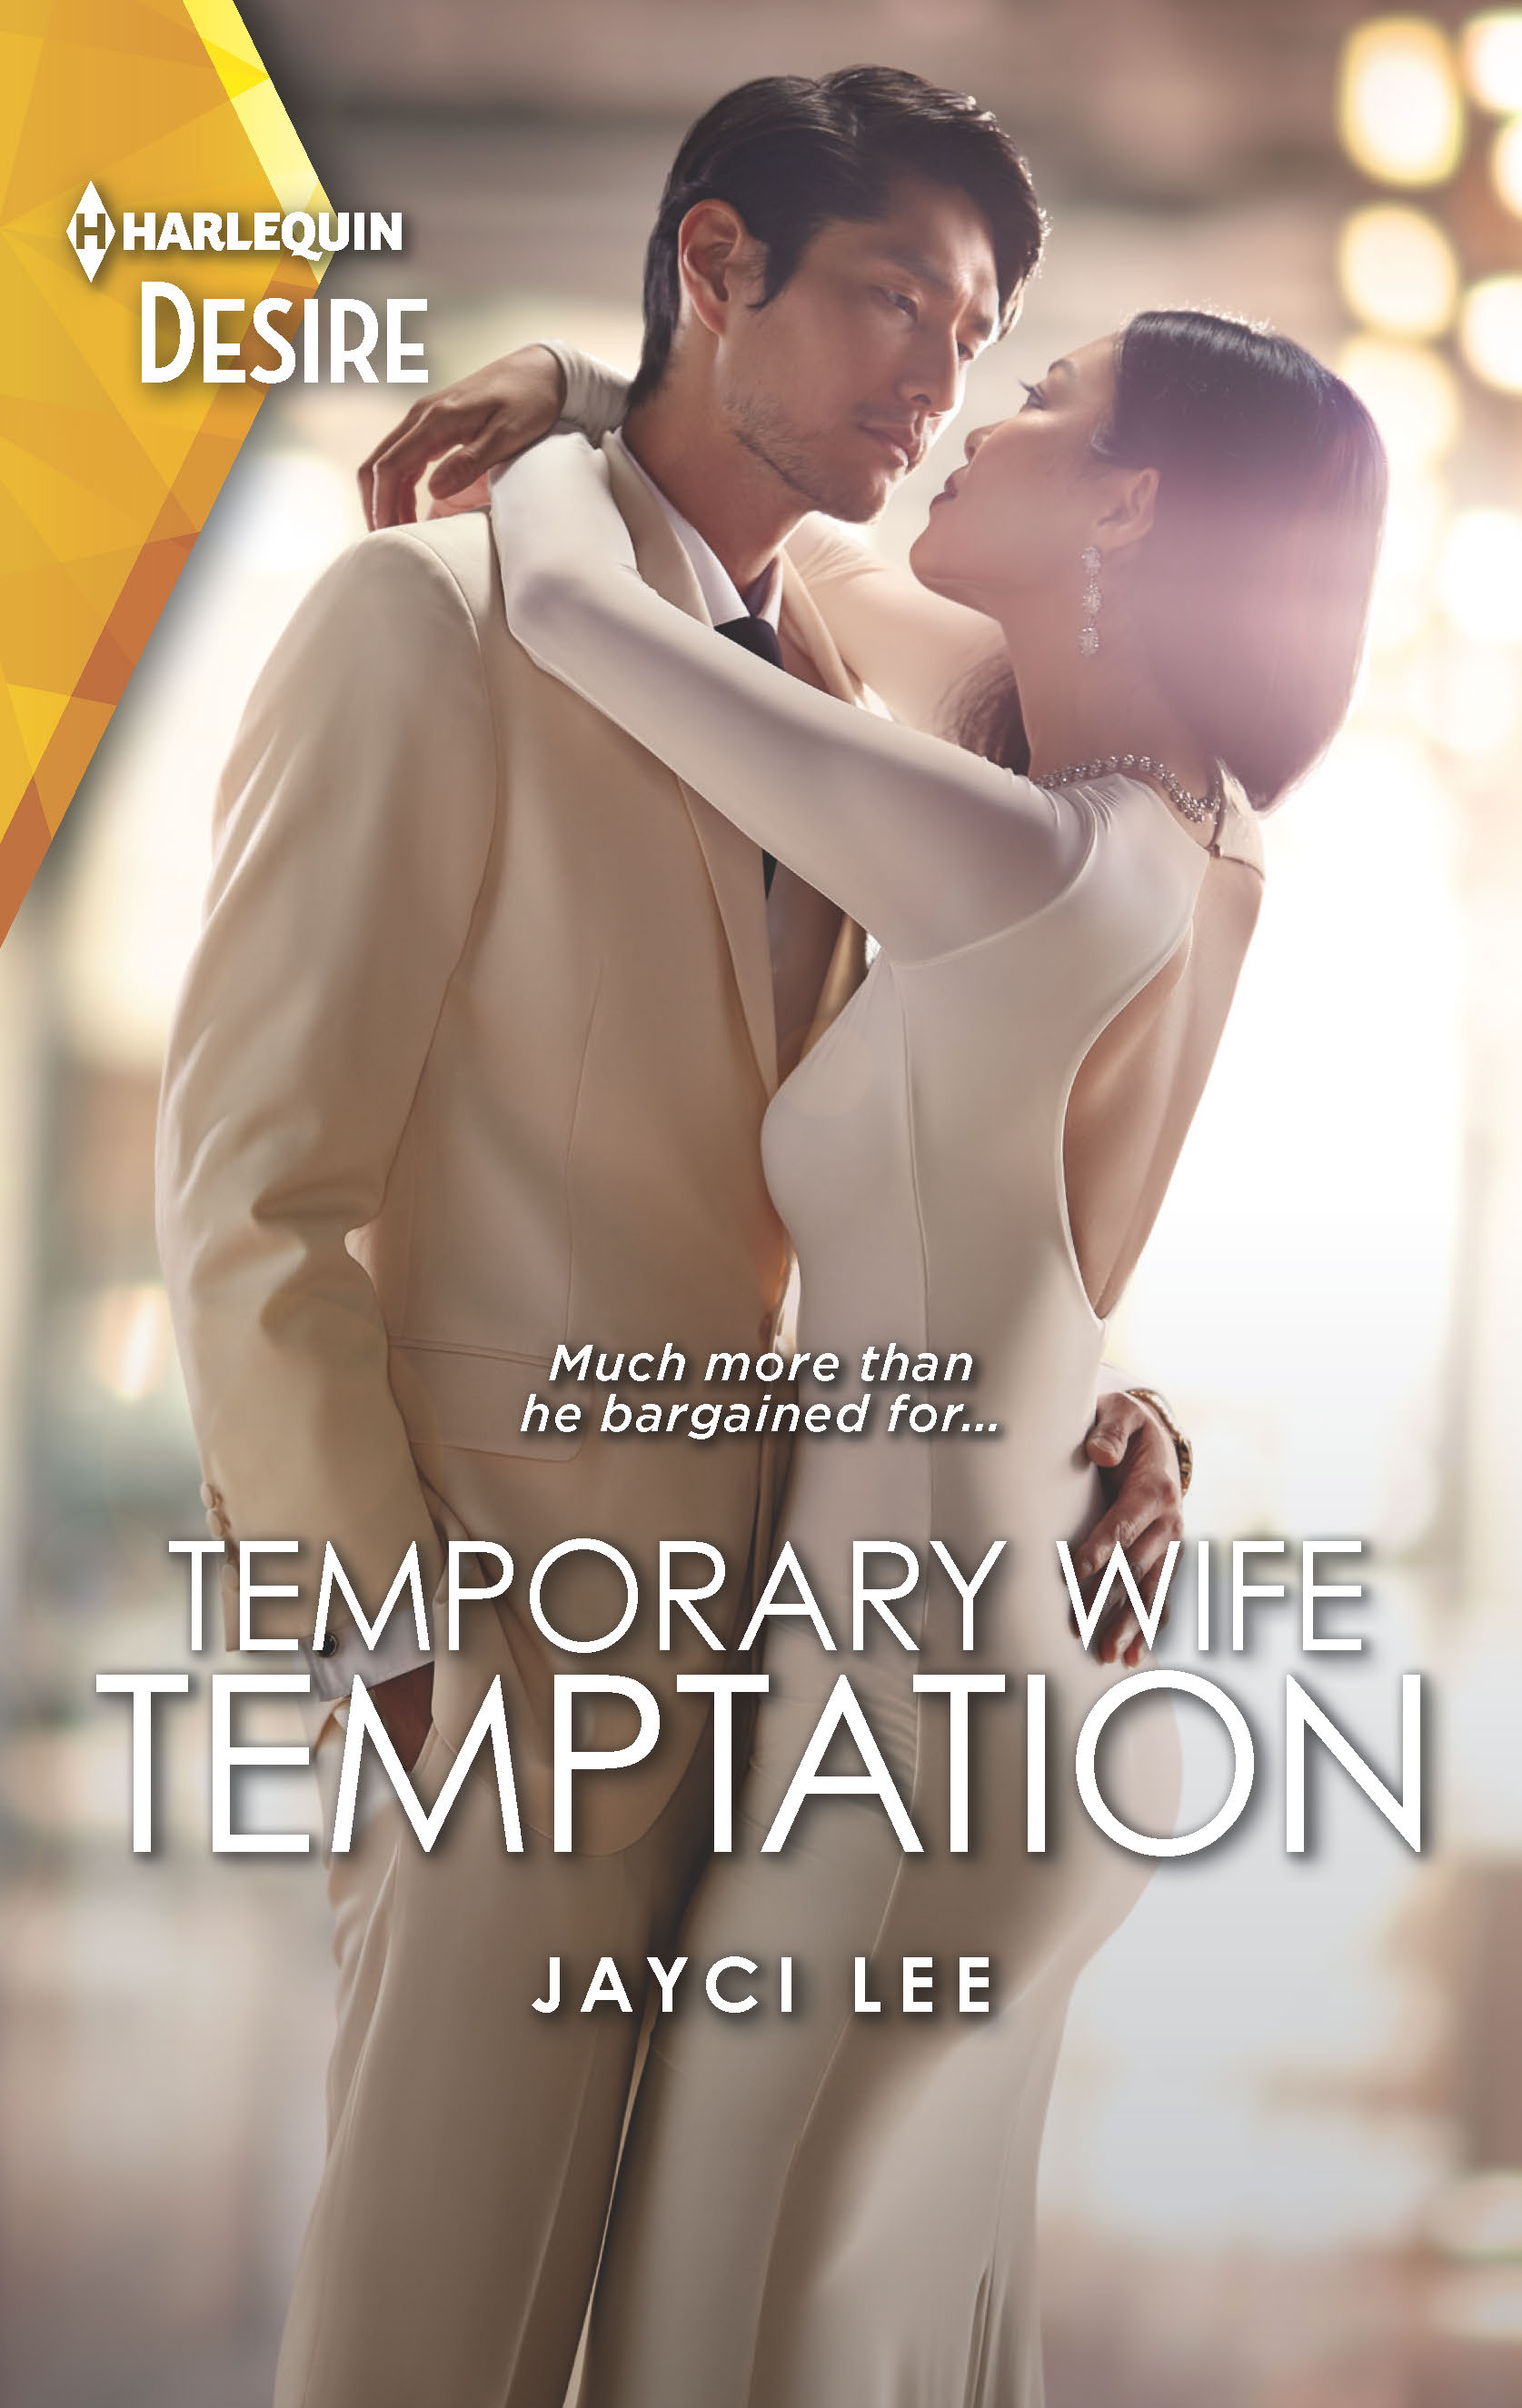 cover_Temporary Wife Temptation_Jayci Lee